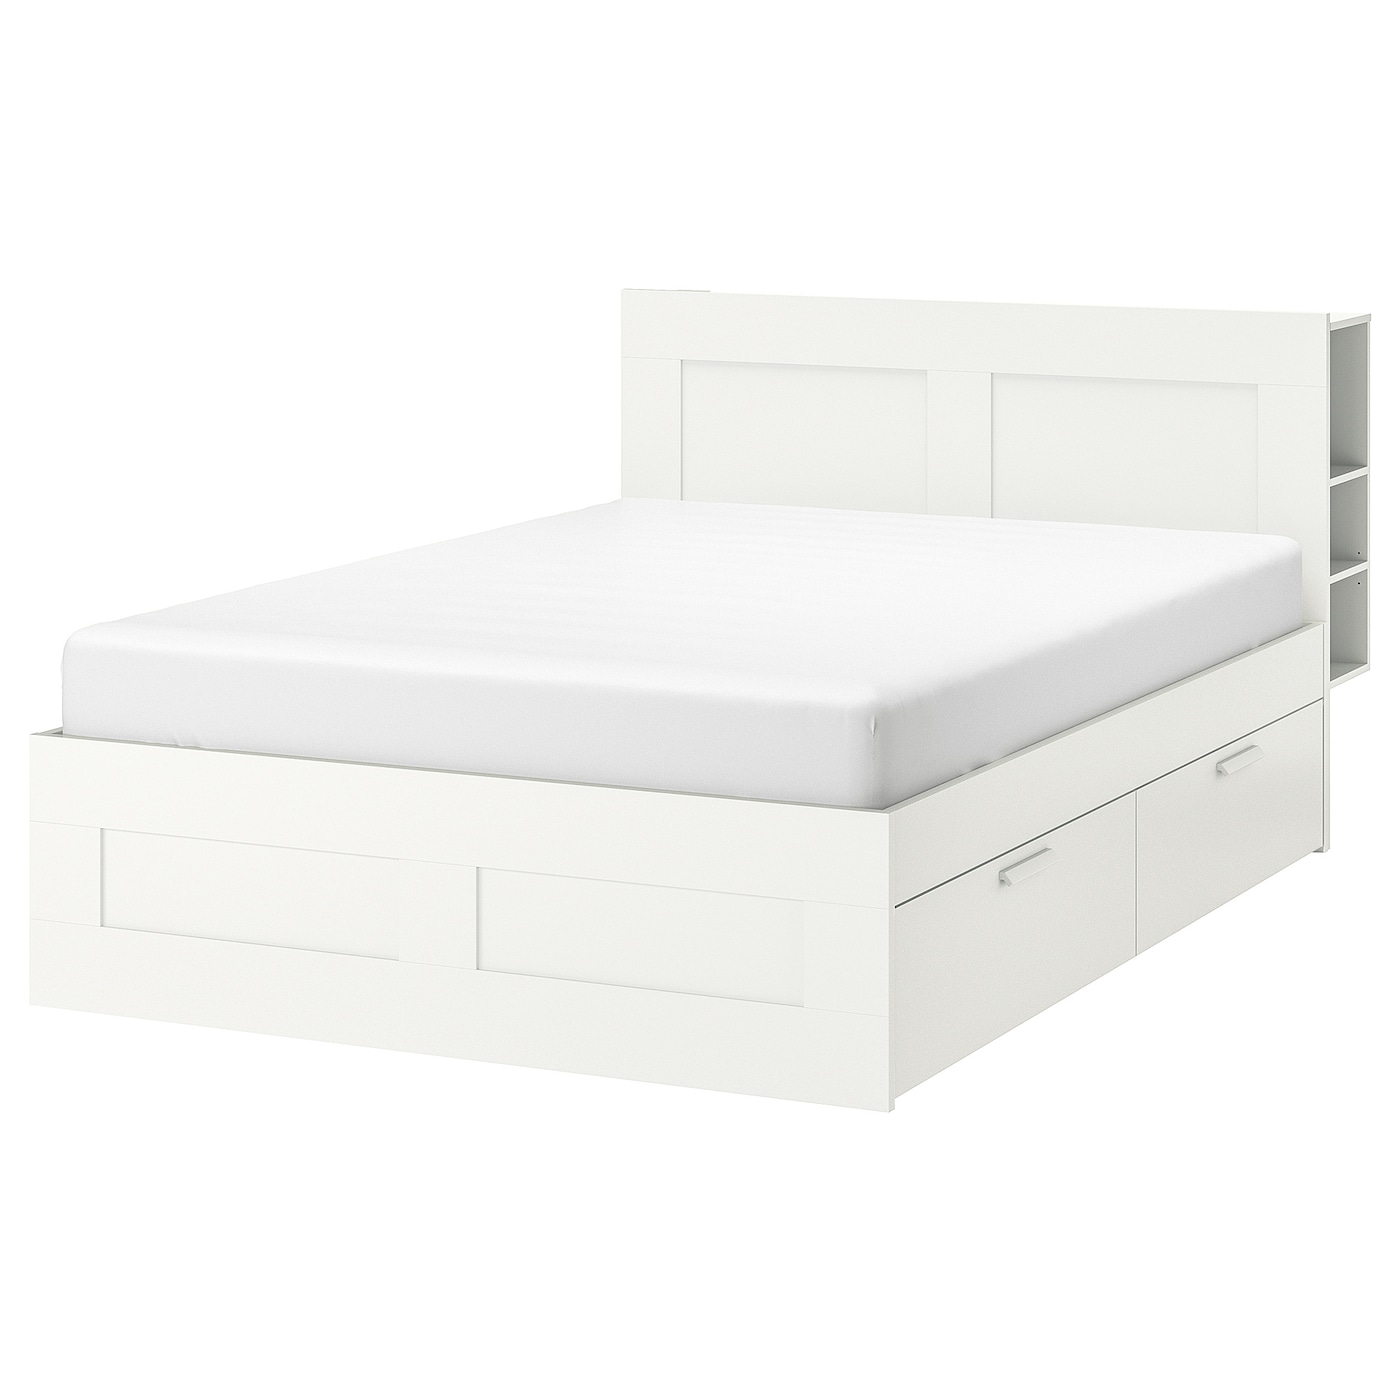 Brimnes Bed Frame With Storage Headboard White Queen Ikea